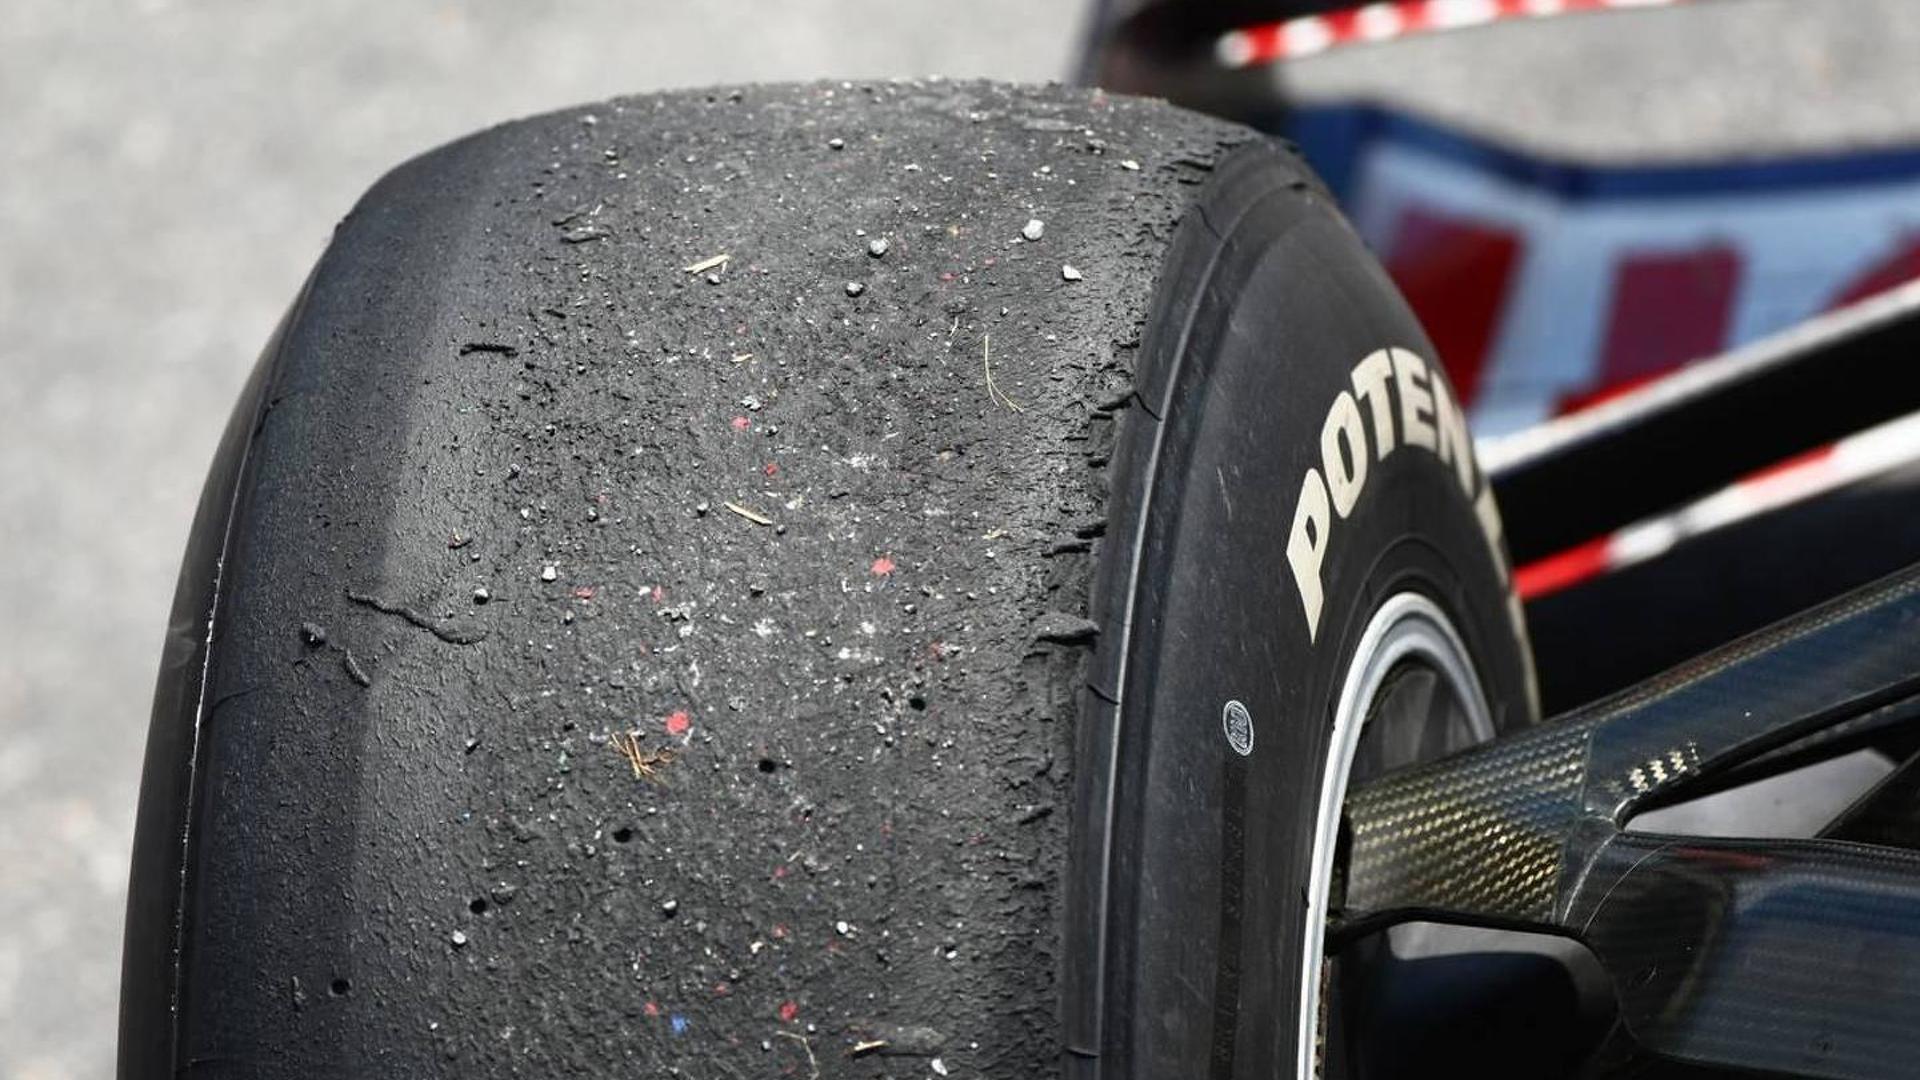 F1 figures frustrated with Bridgestone's 2010 tyre